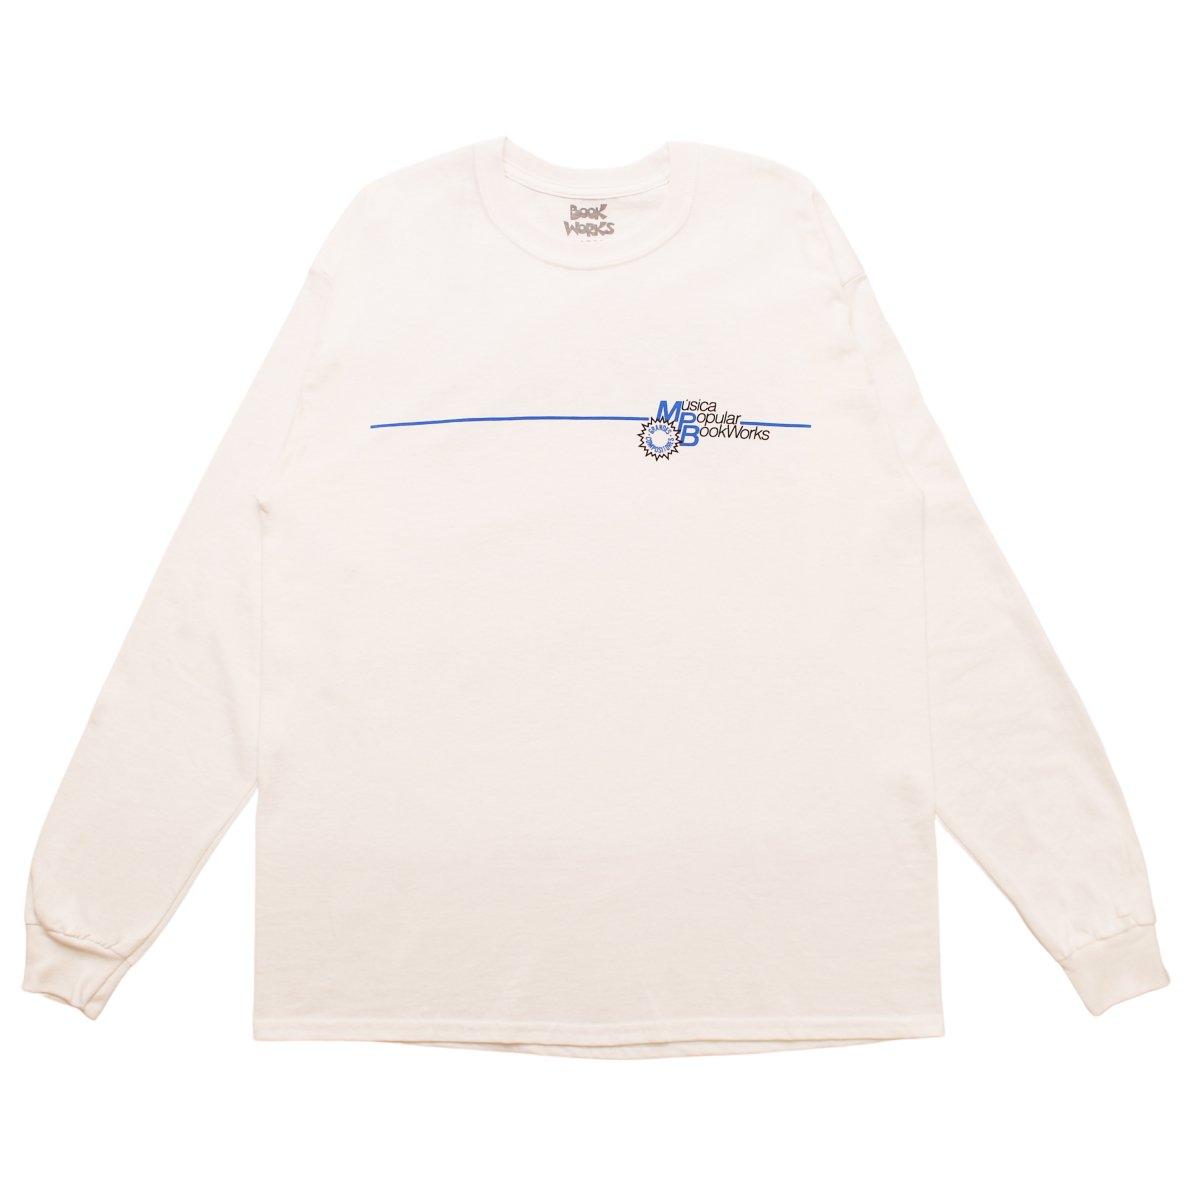 MPB L/S SHIRTS 【WHITE】